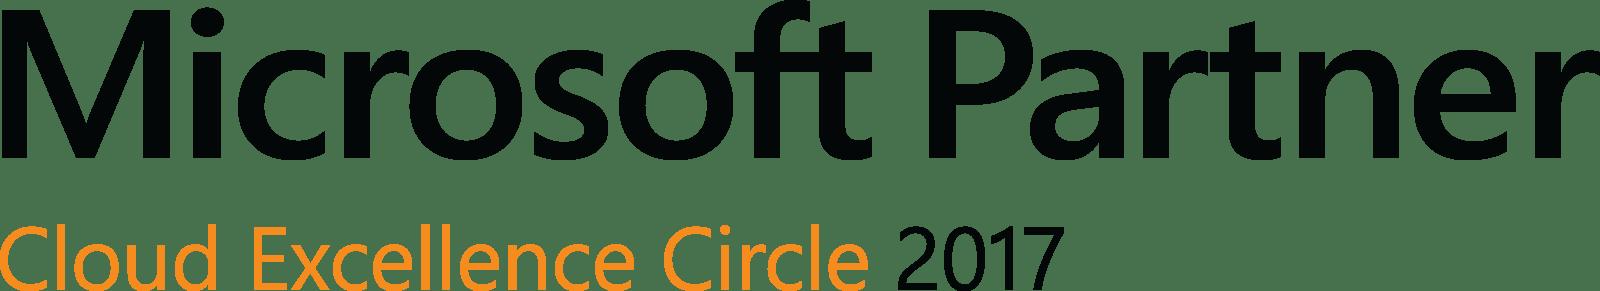 Microsoft Partner Logo CEC rgb 3